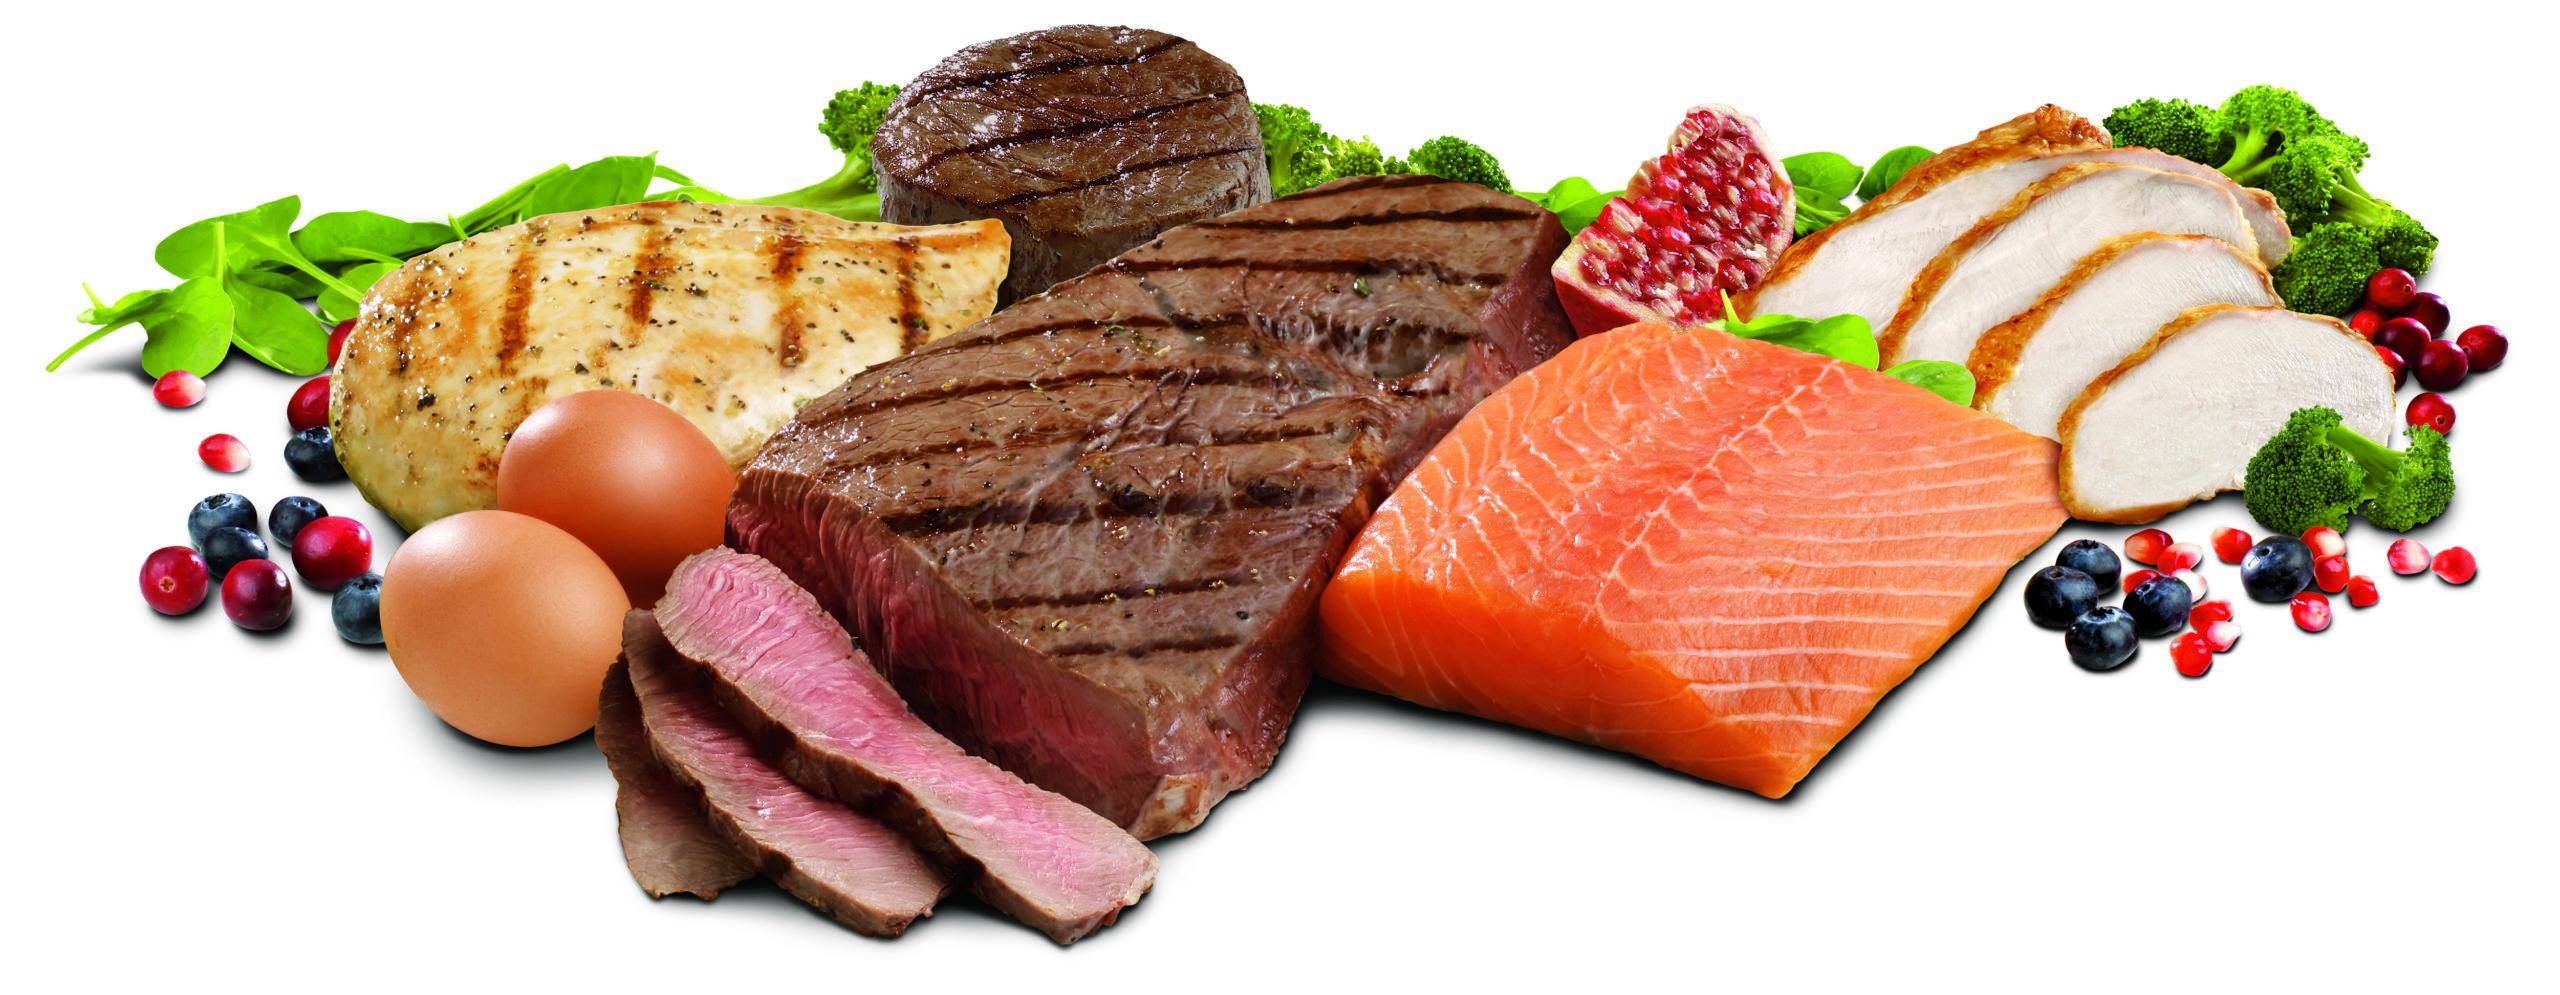 Best weight loss foods uk website